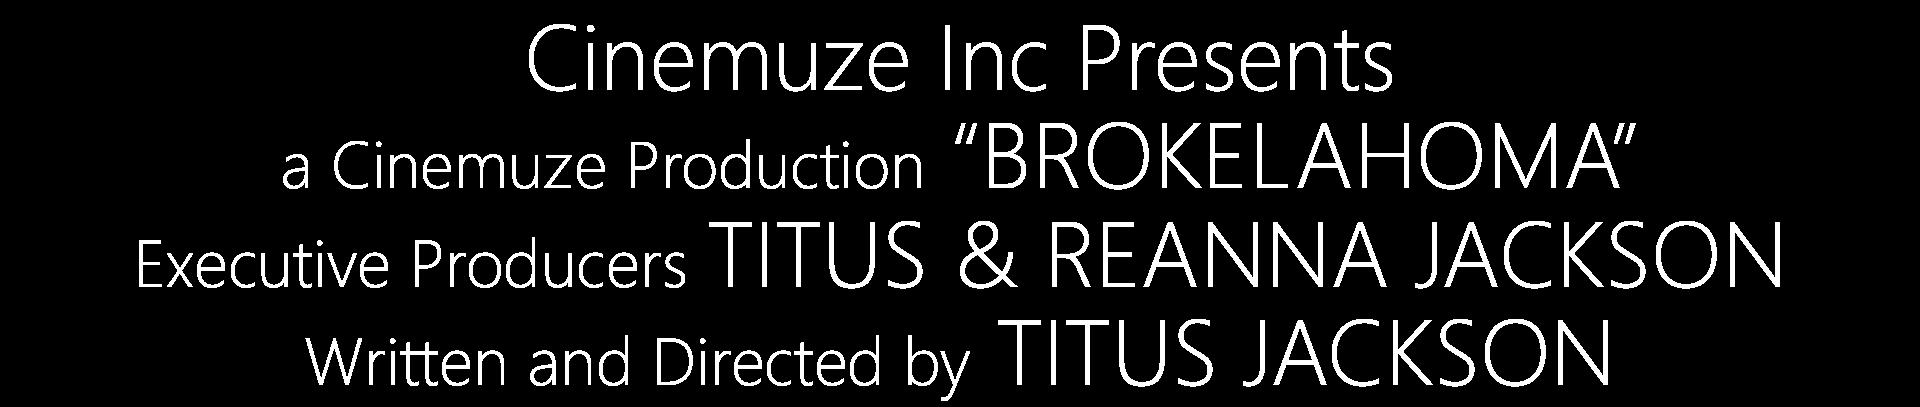 new new credits.png